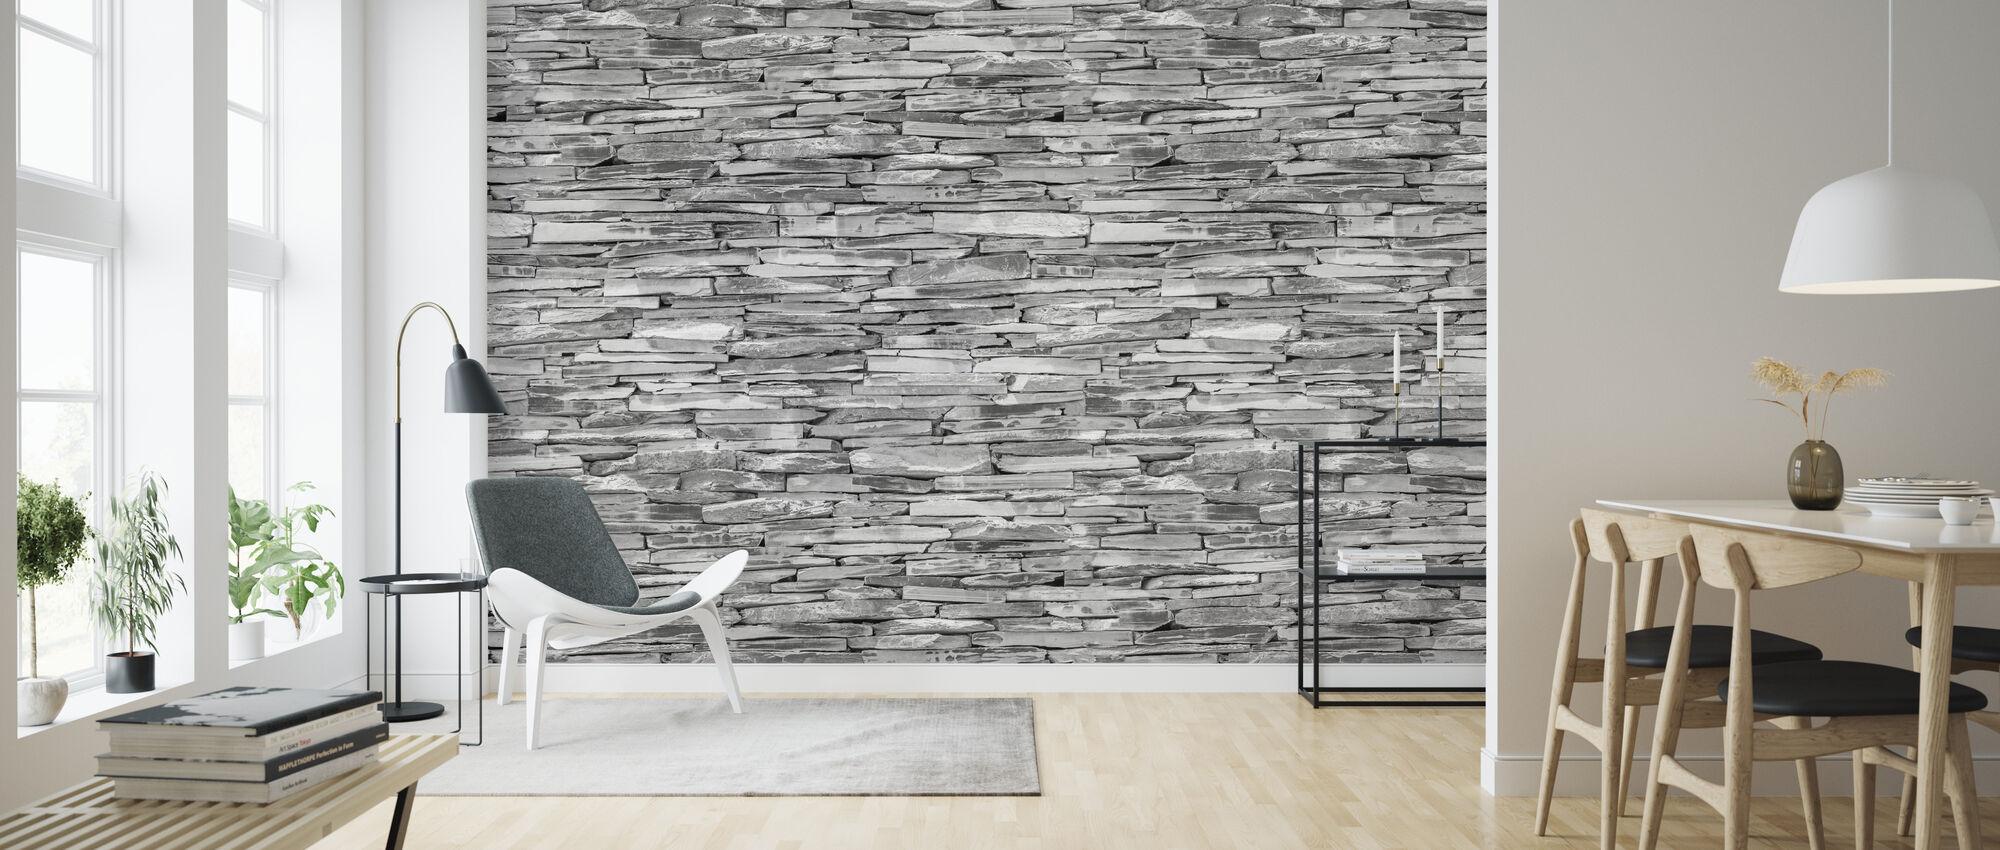 Stone Wall - Granite - Wallpaper - Living Room